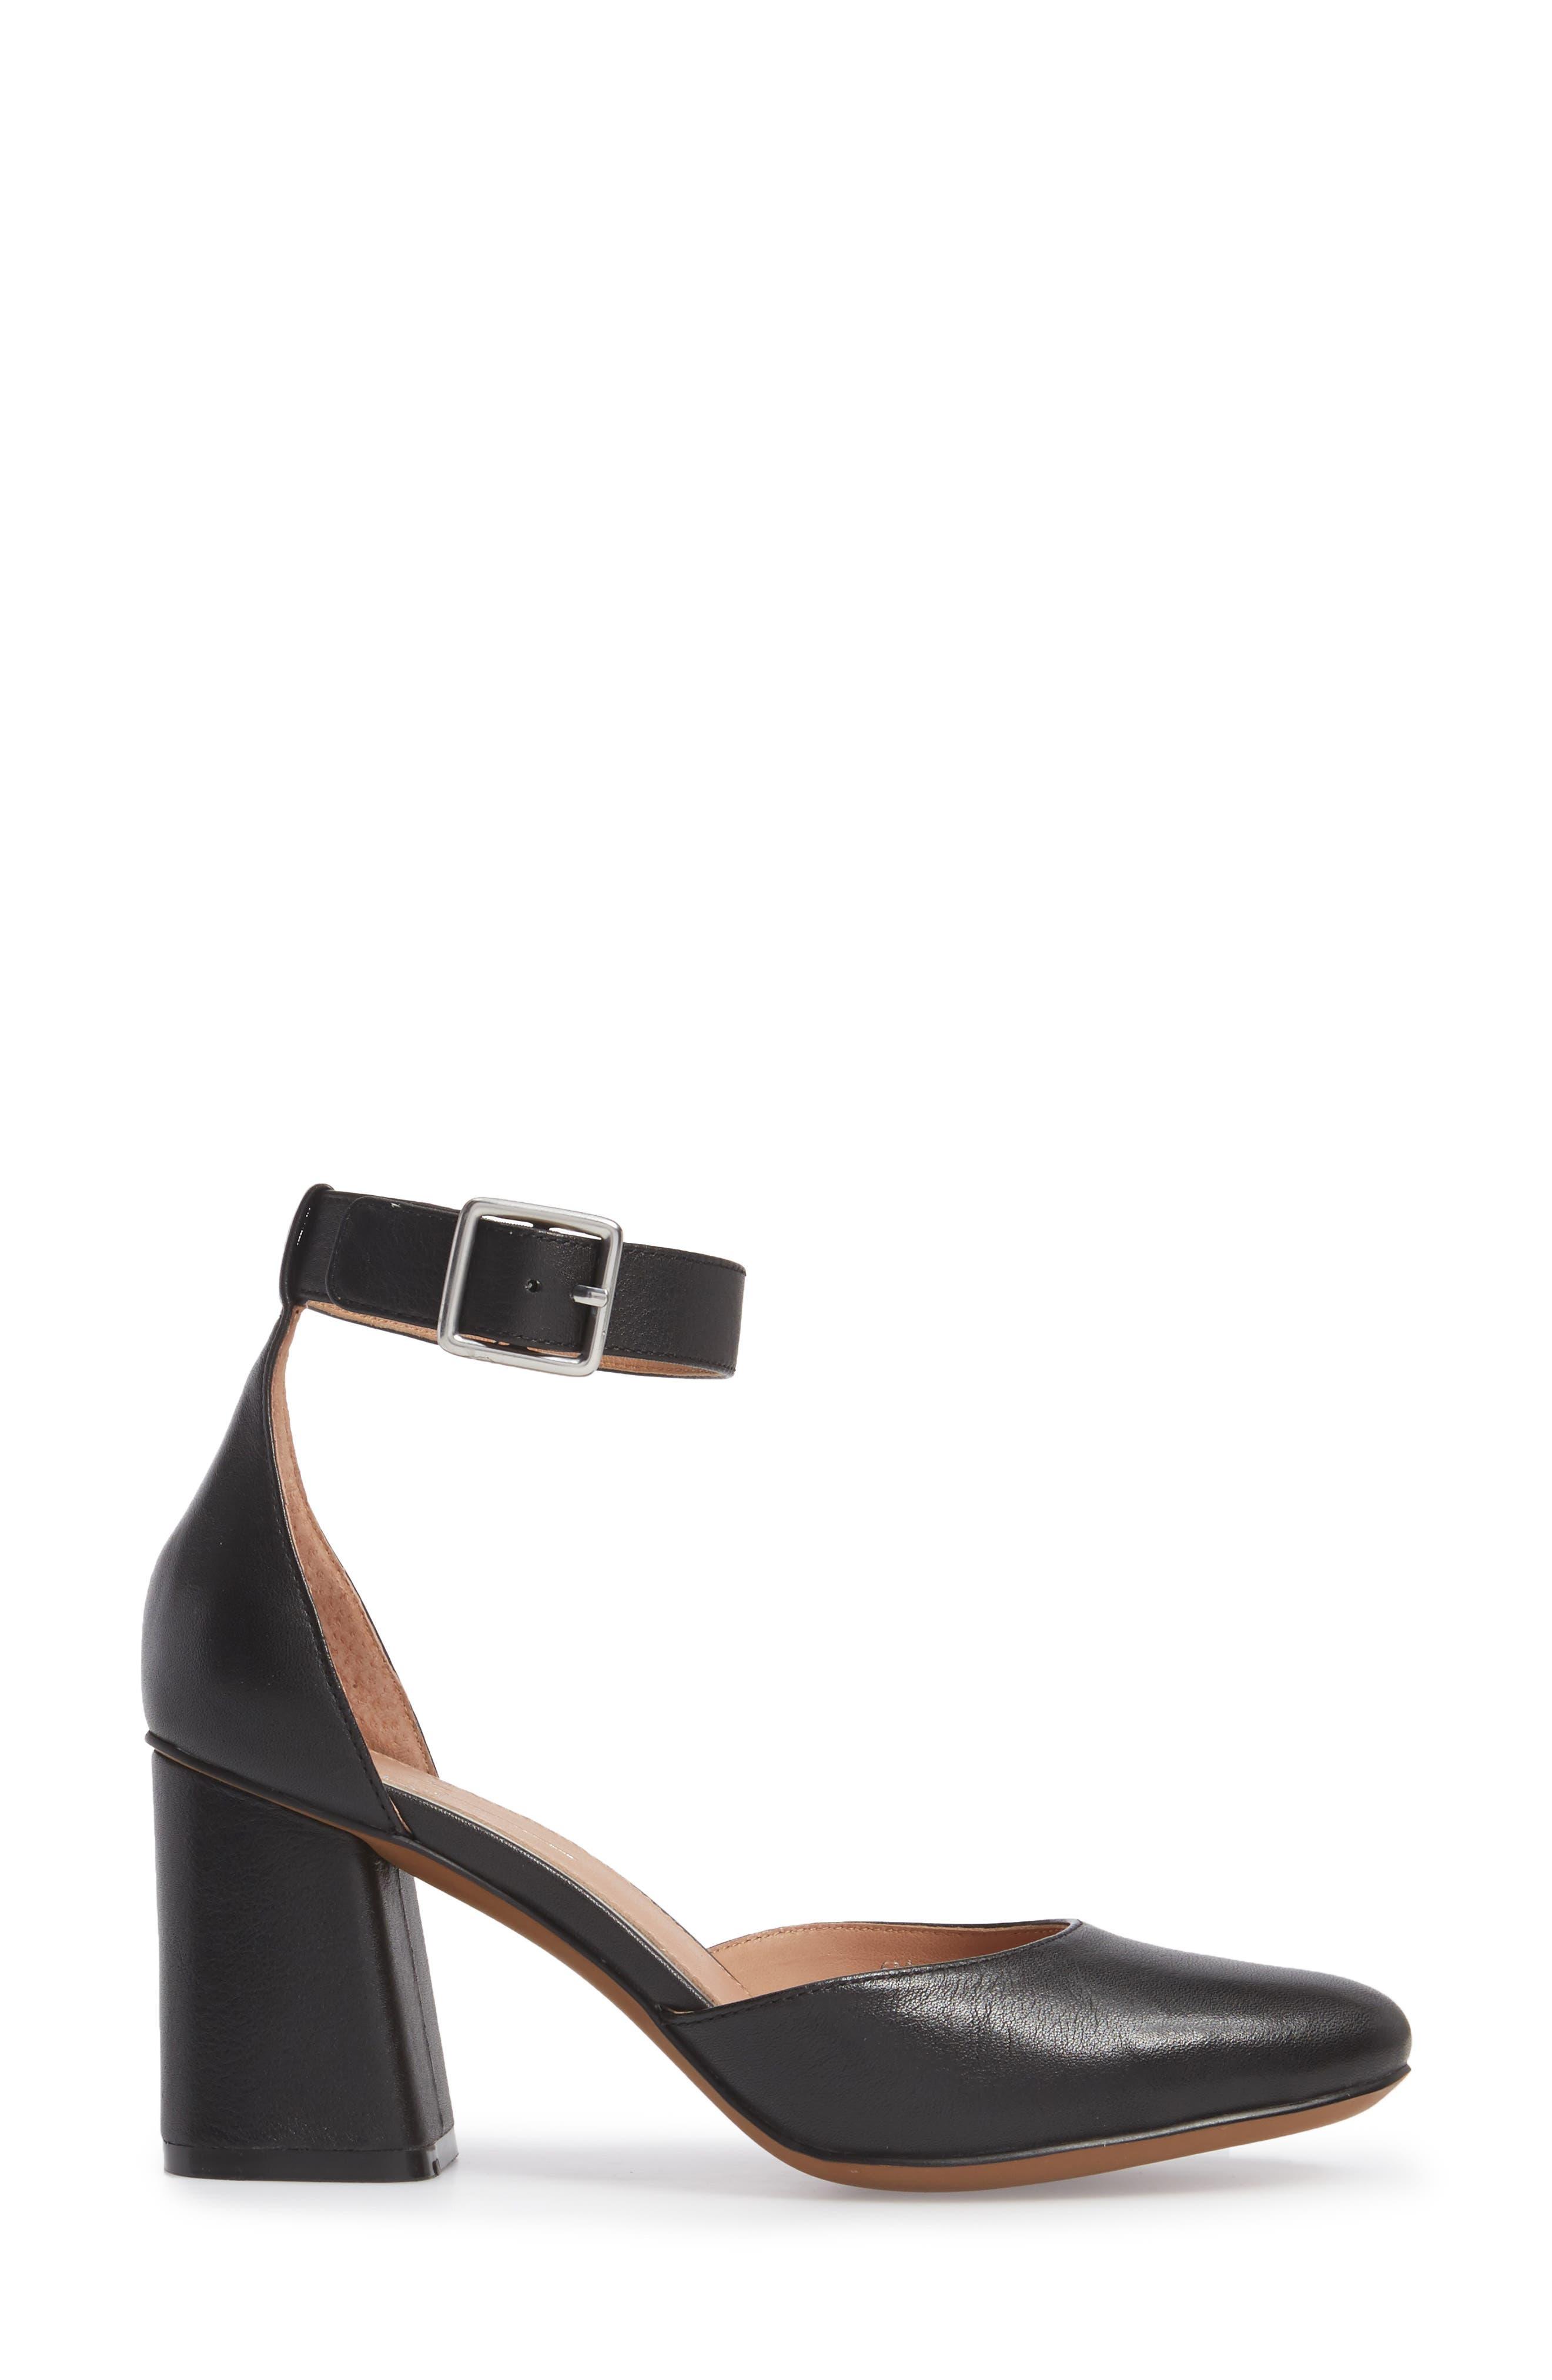 Maya Ankle Strap Pump,                             Alternate thumbnail 3, color,                             Black Leather